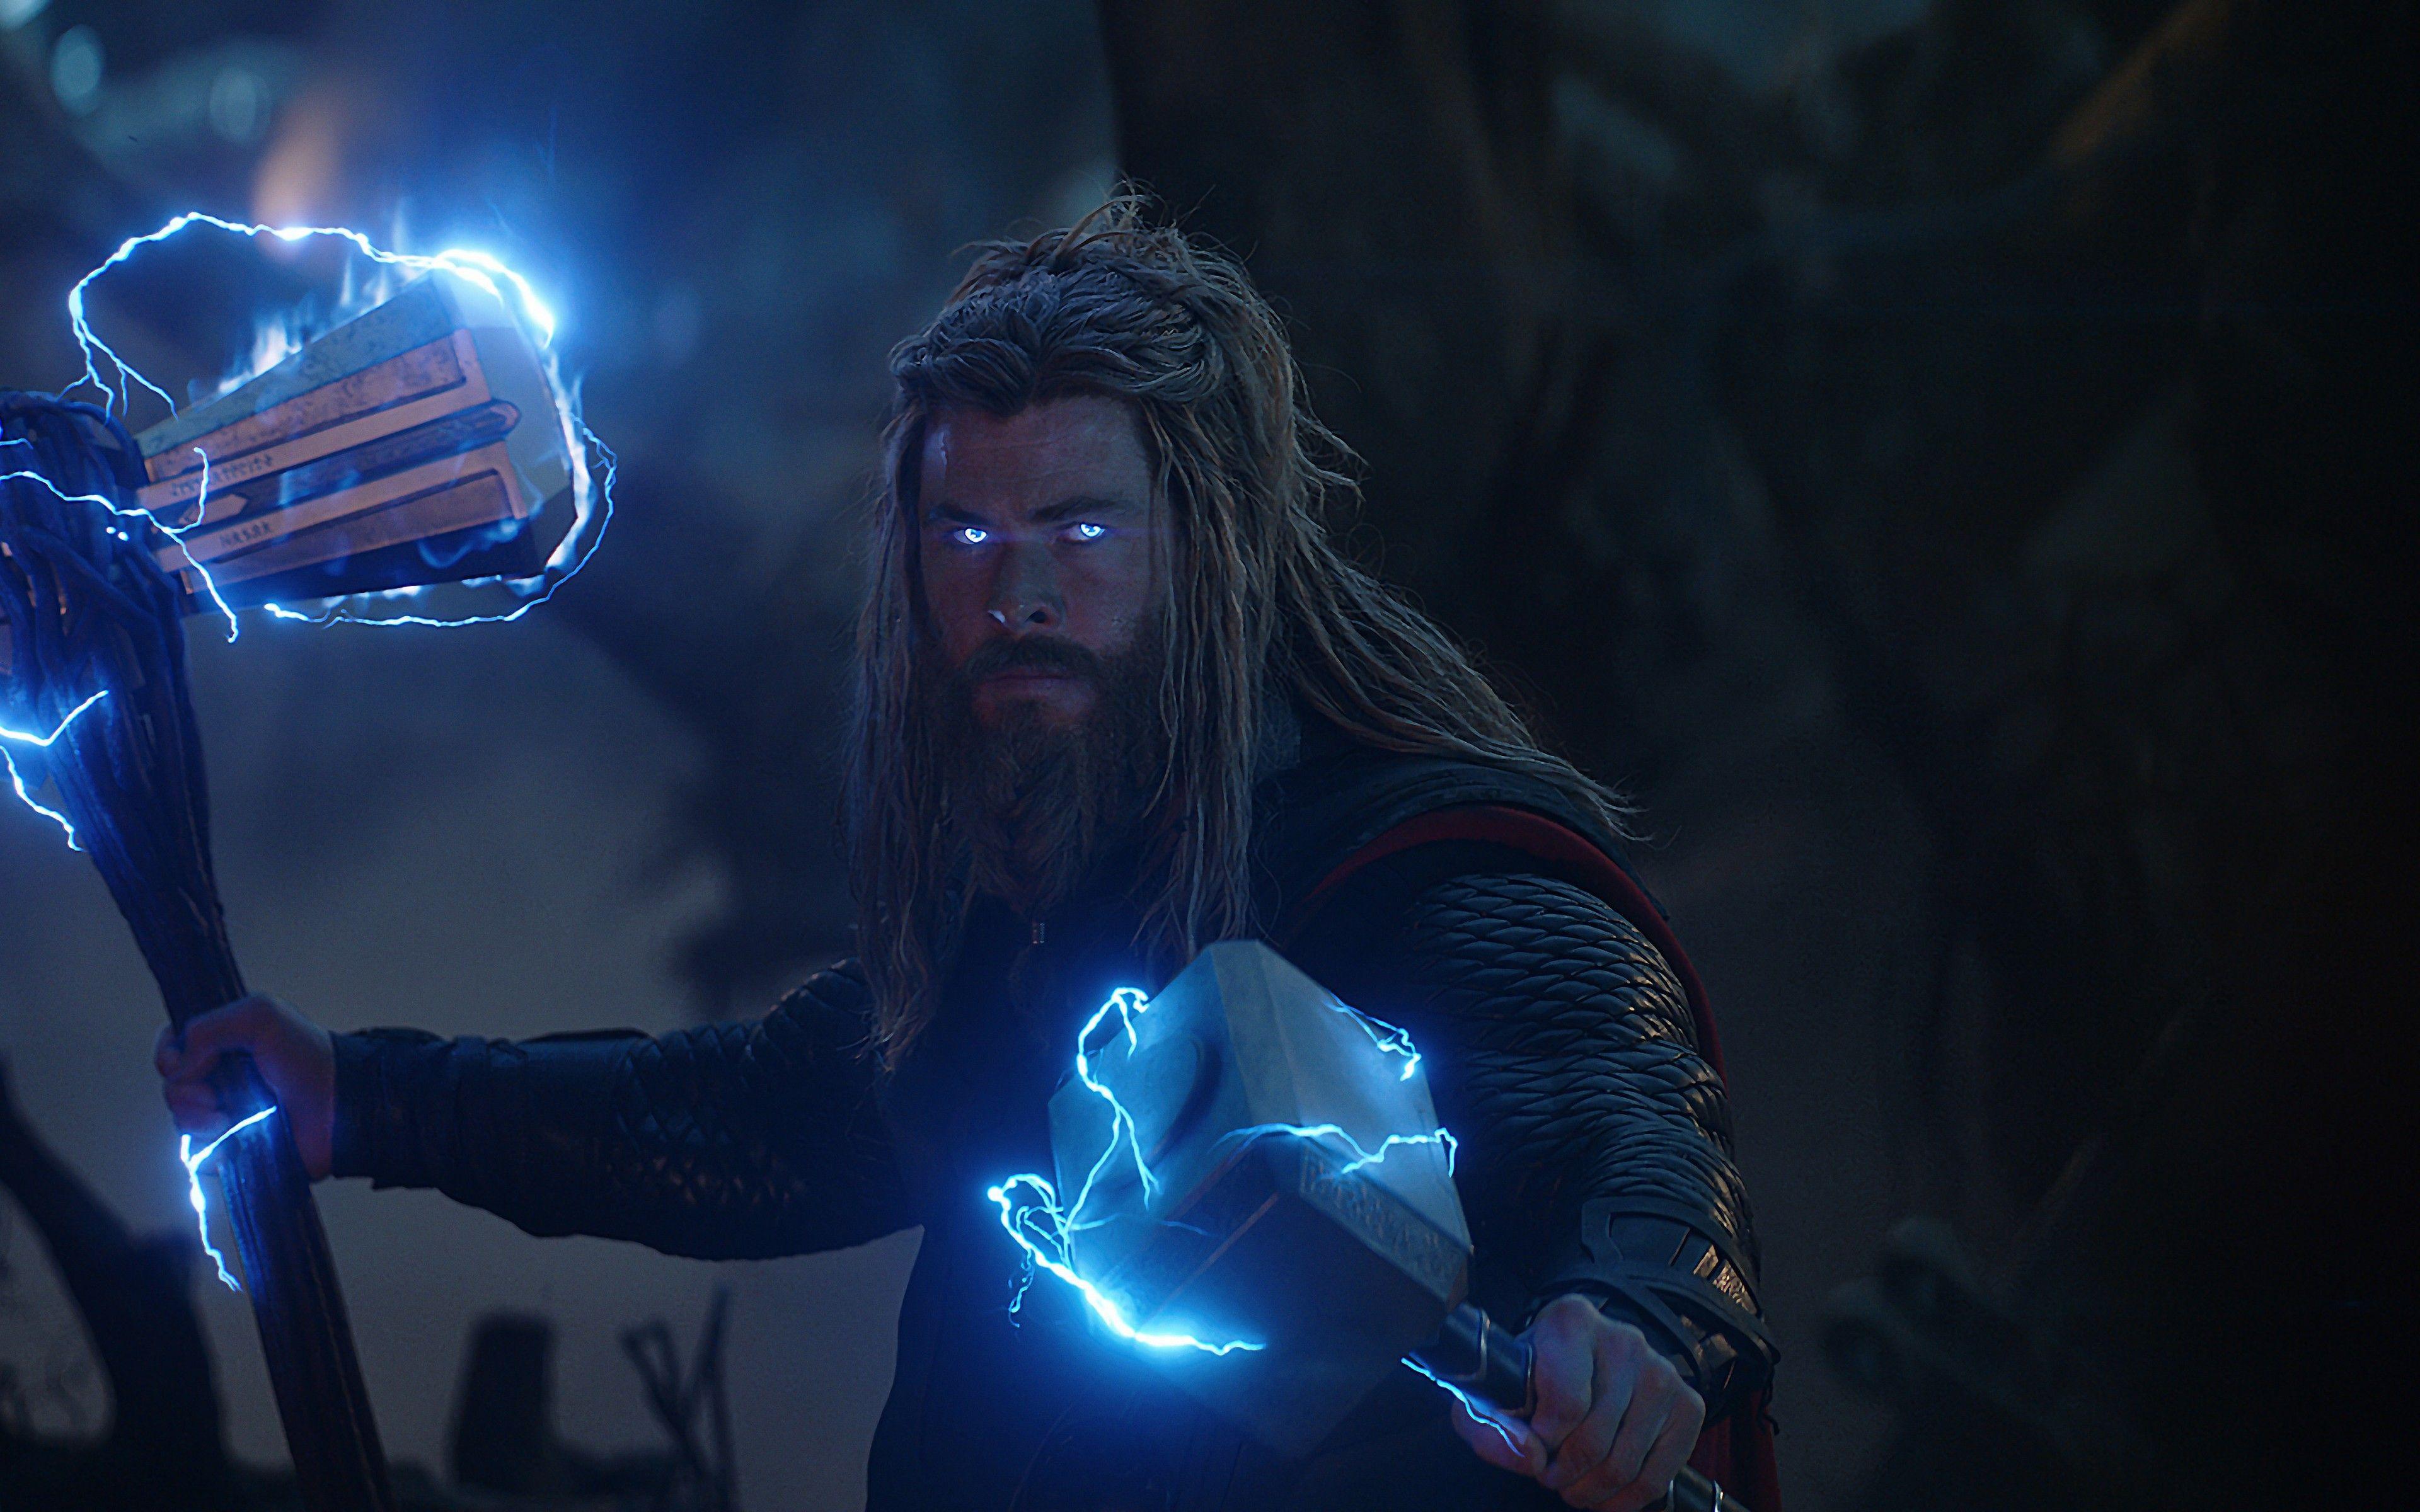 Thor Endgame Wallpapers Top Free Thor Endgame Backgrounds Wallpaperaccess